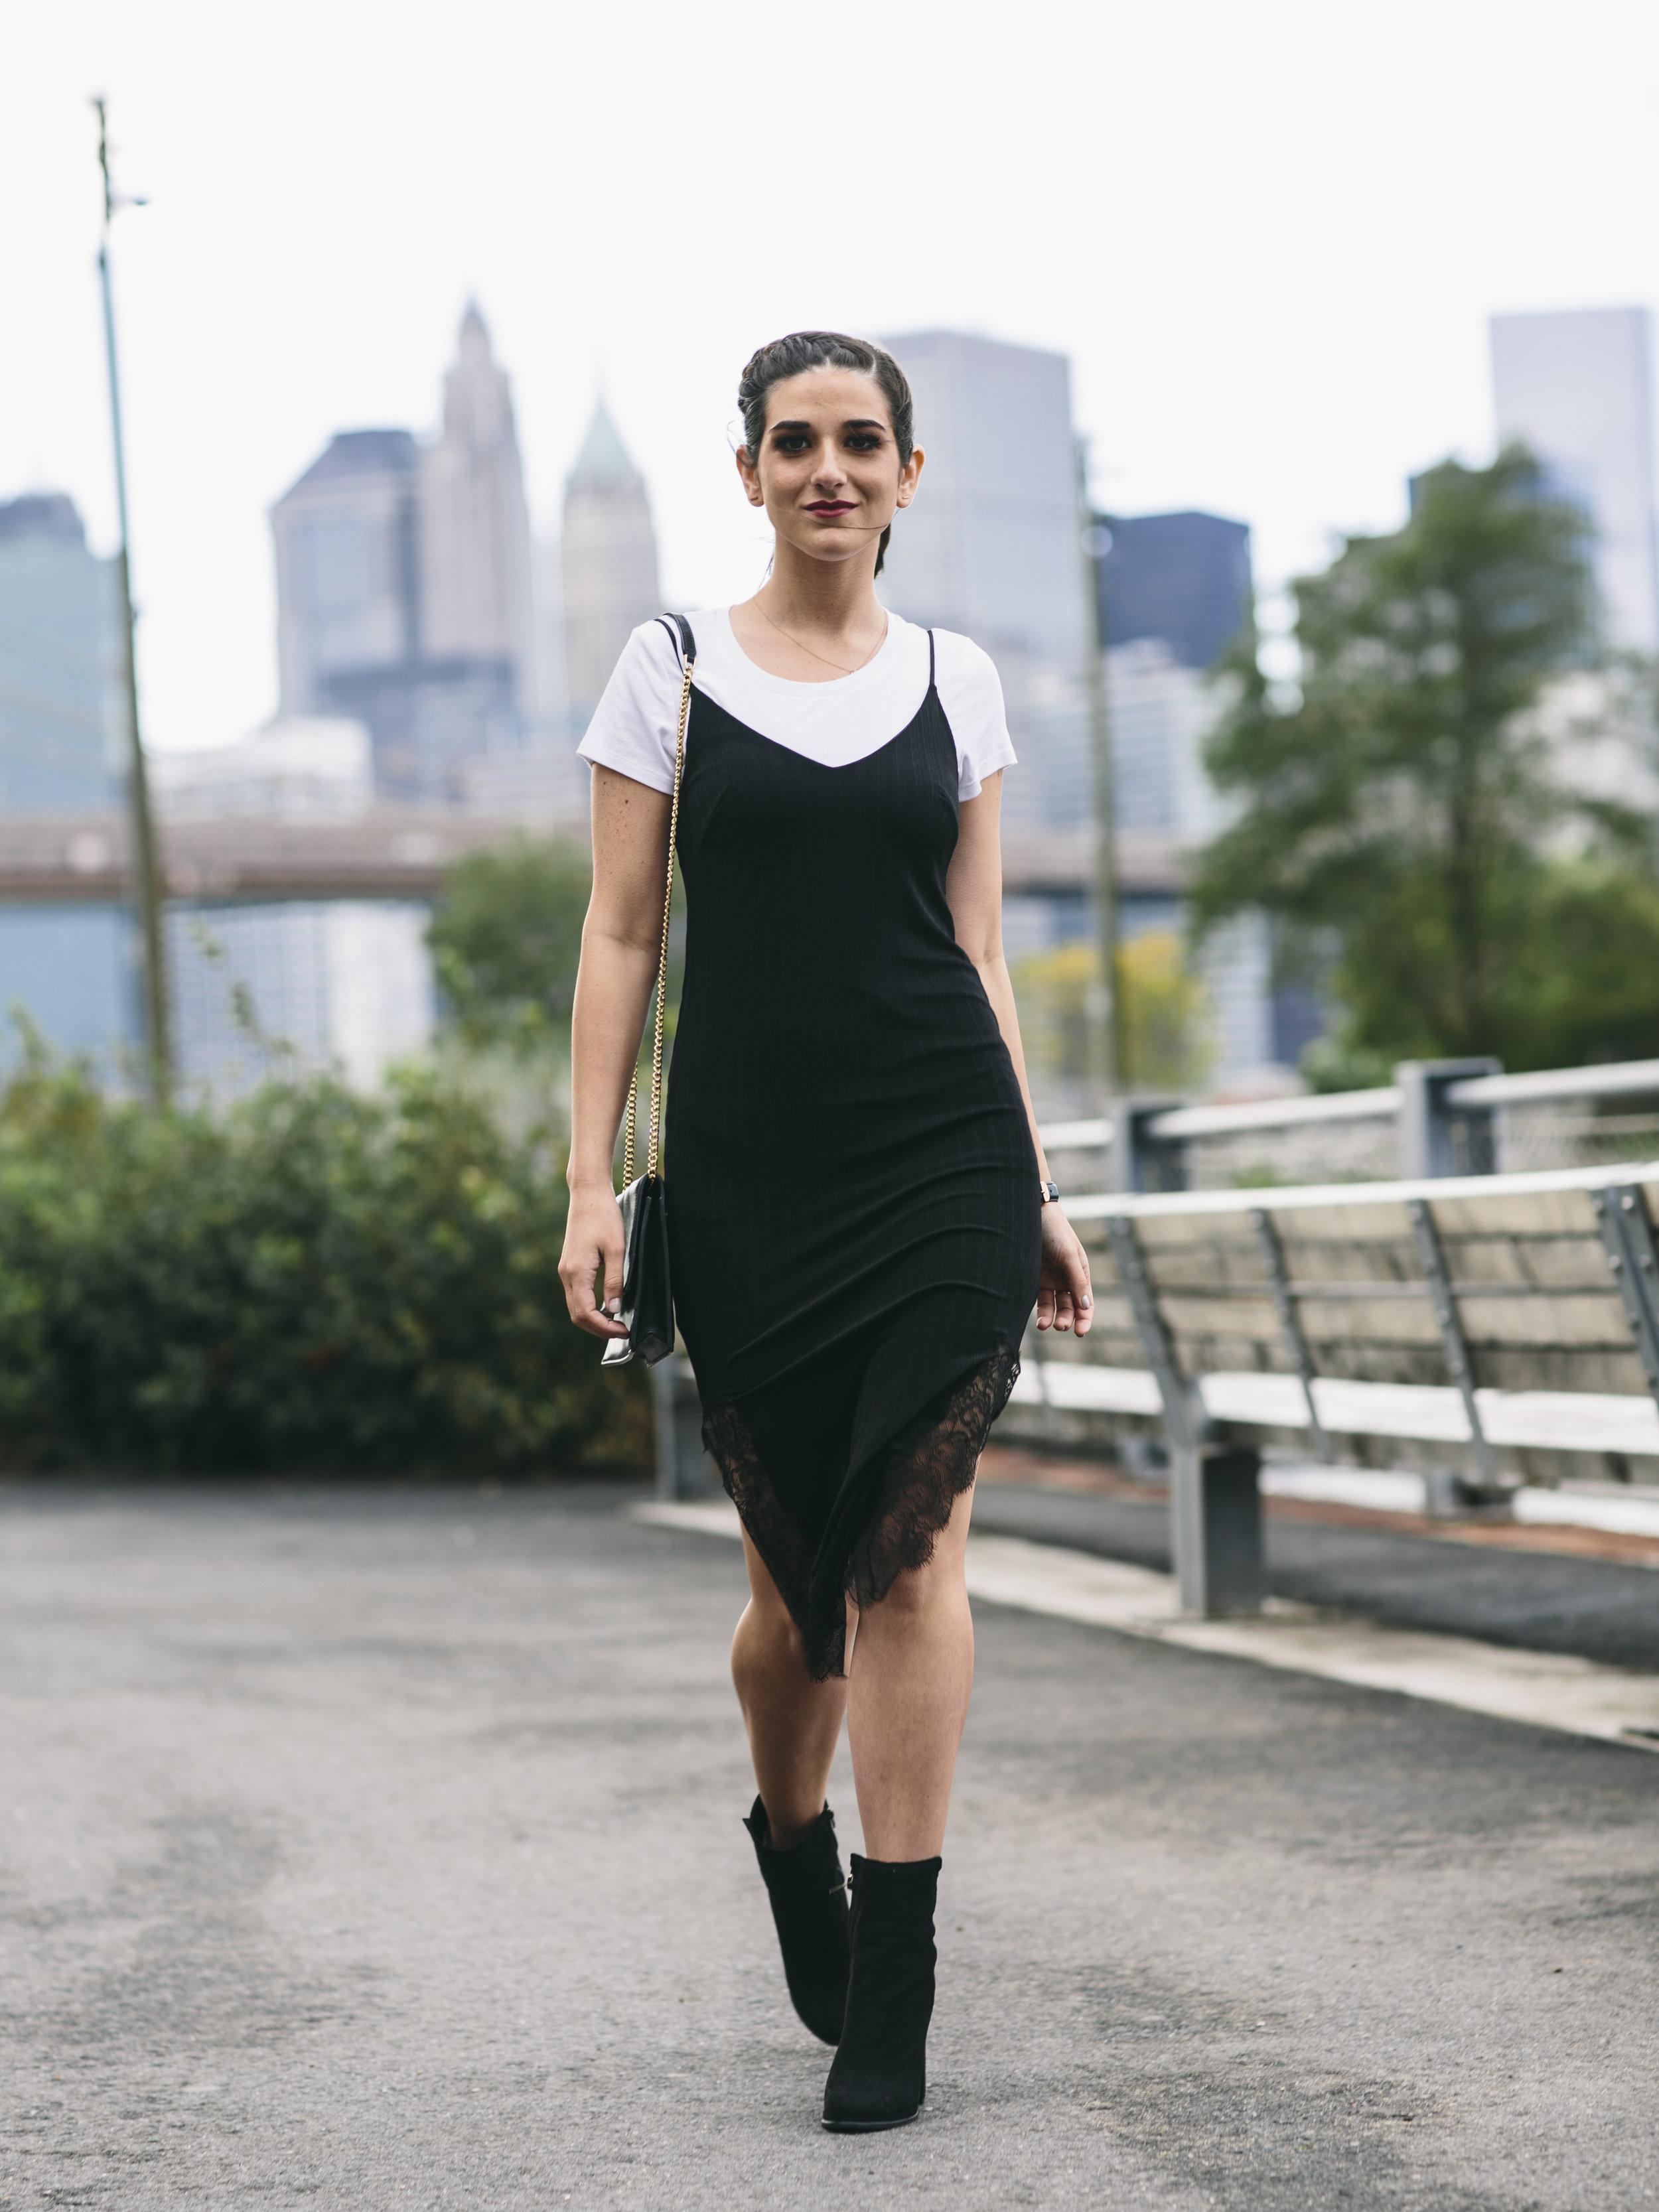 fb034194b3 Black Lace Slip Dress Over White Tee Louboutins   Love Fashion Blog Esther  Santer NYC Street